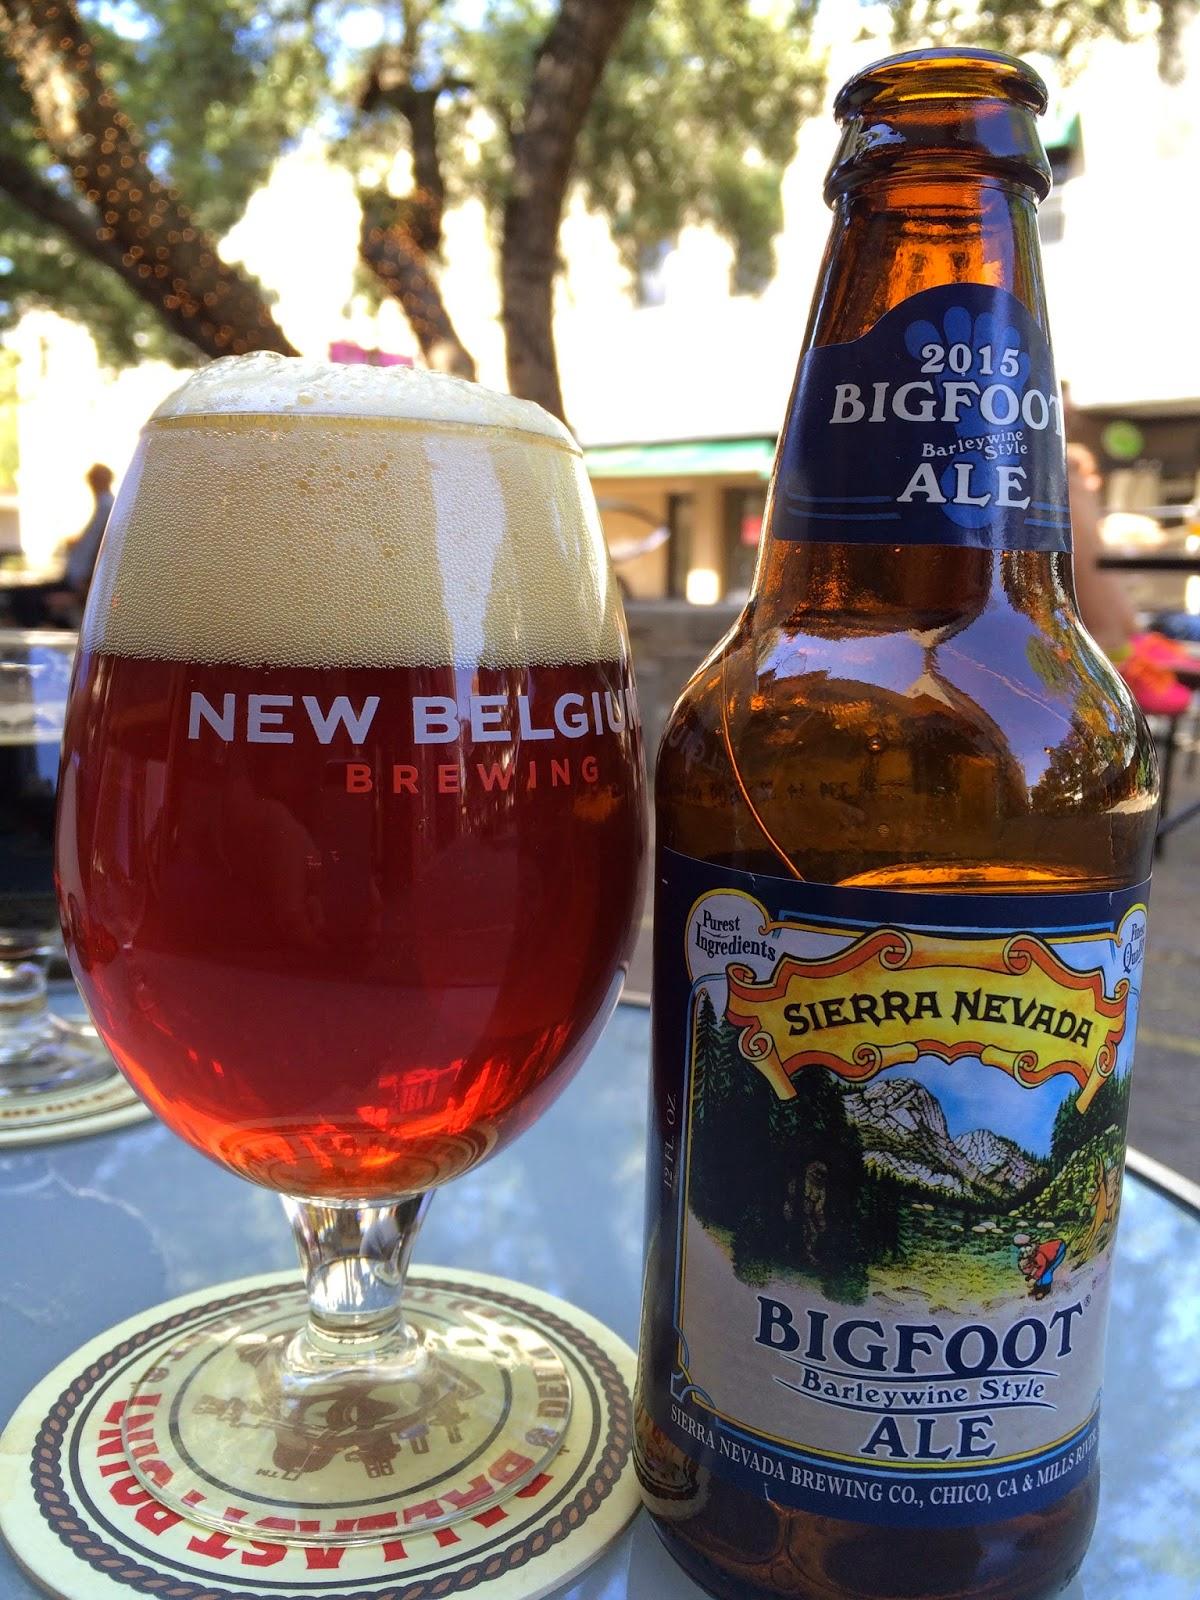 Sierra Nevada Bigfoot Ale 1